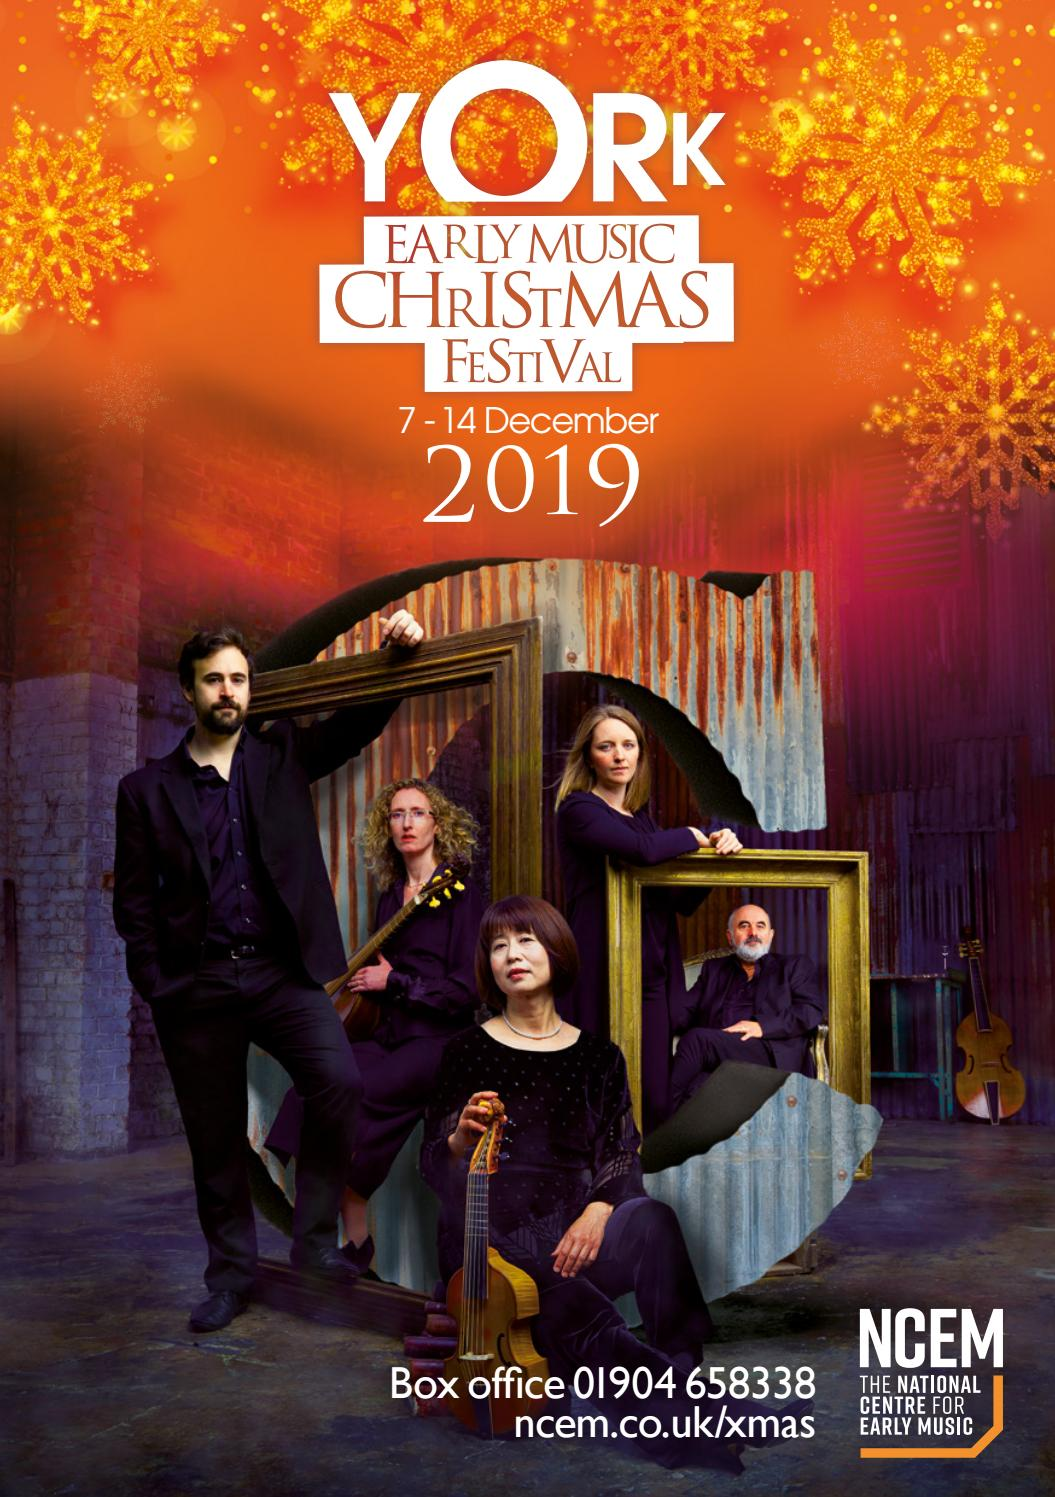 2019 Christmas Music.York Early Music Christmas Festival 2019 Brochure By Ncem